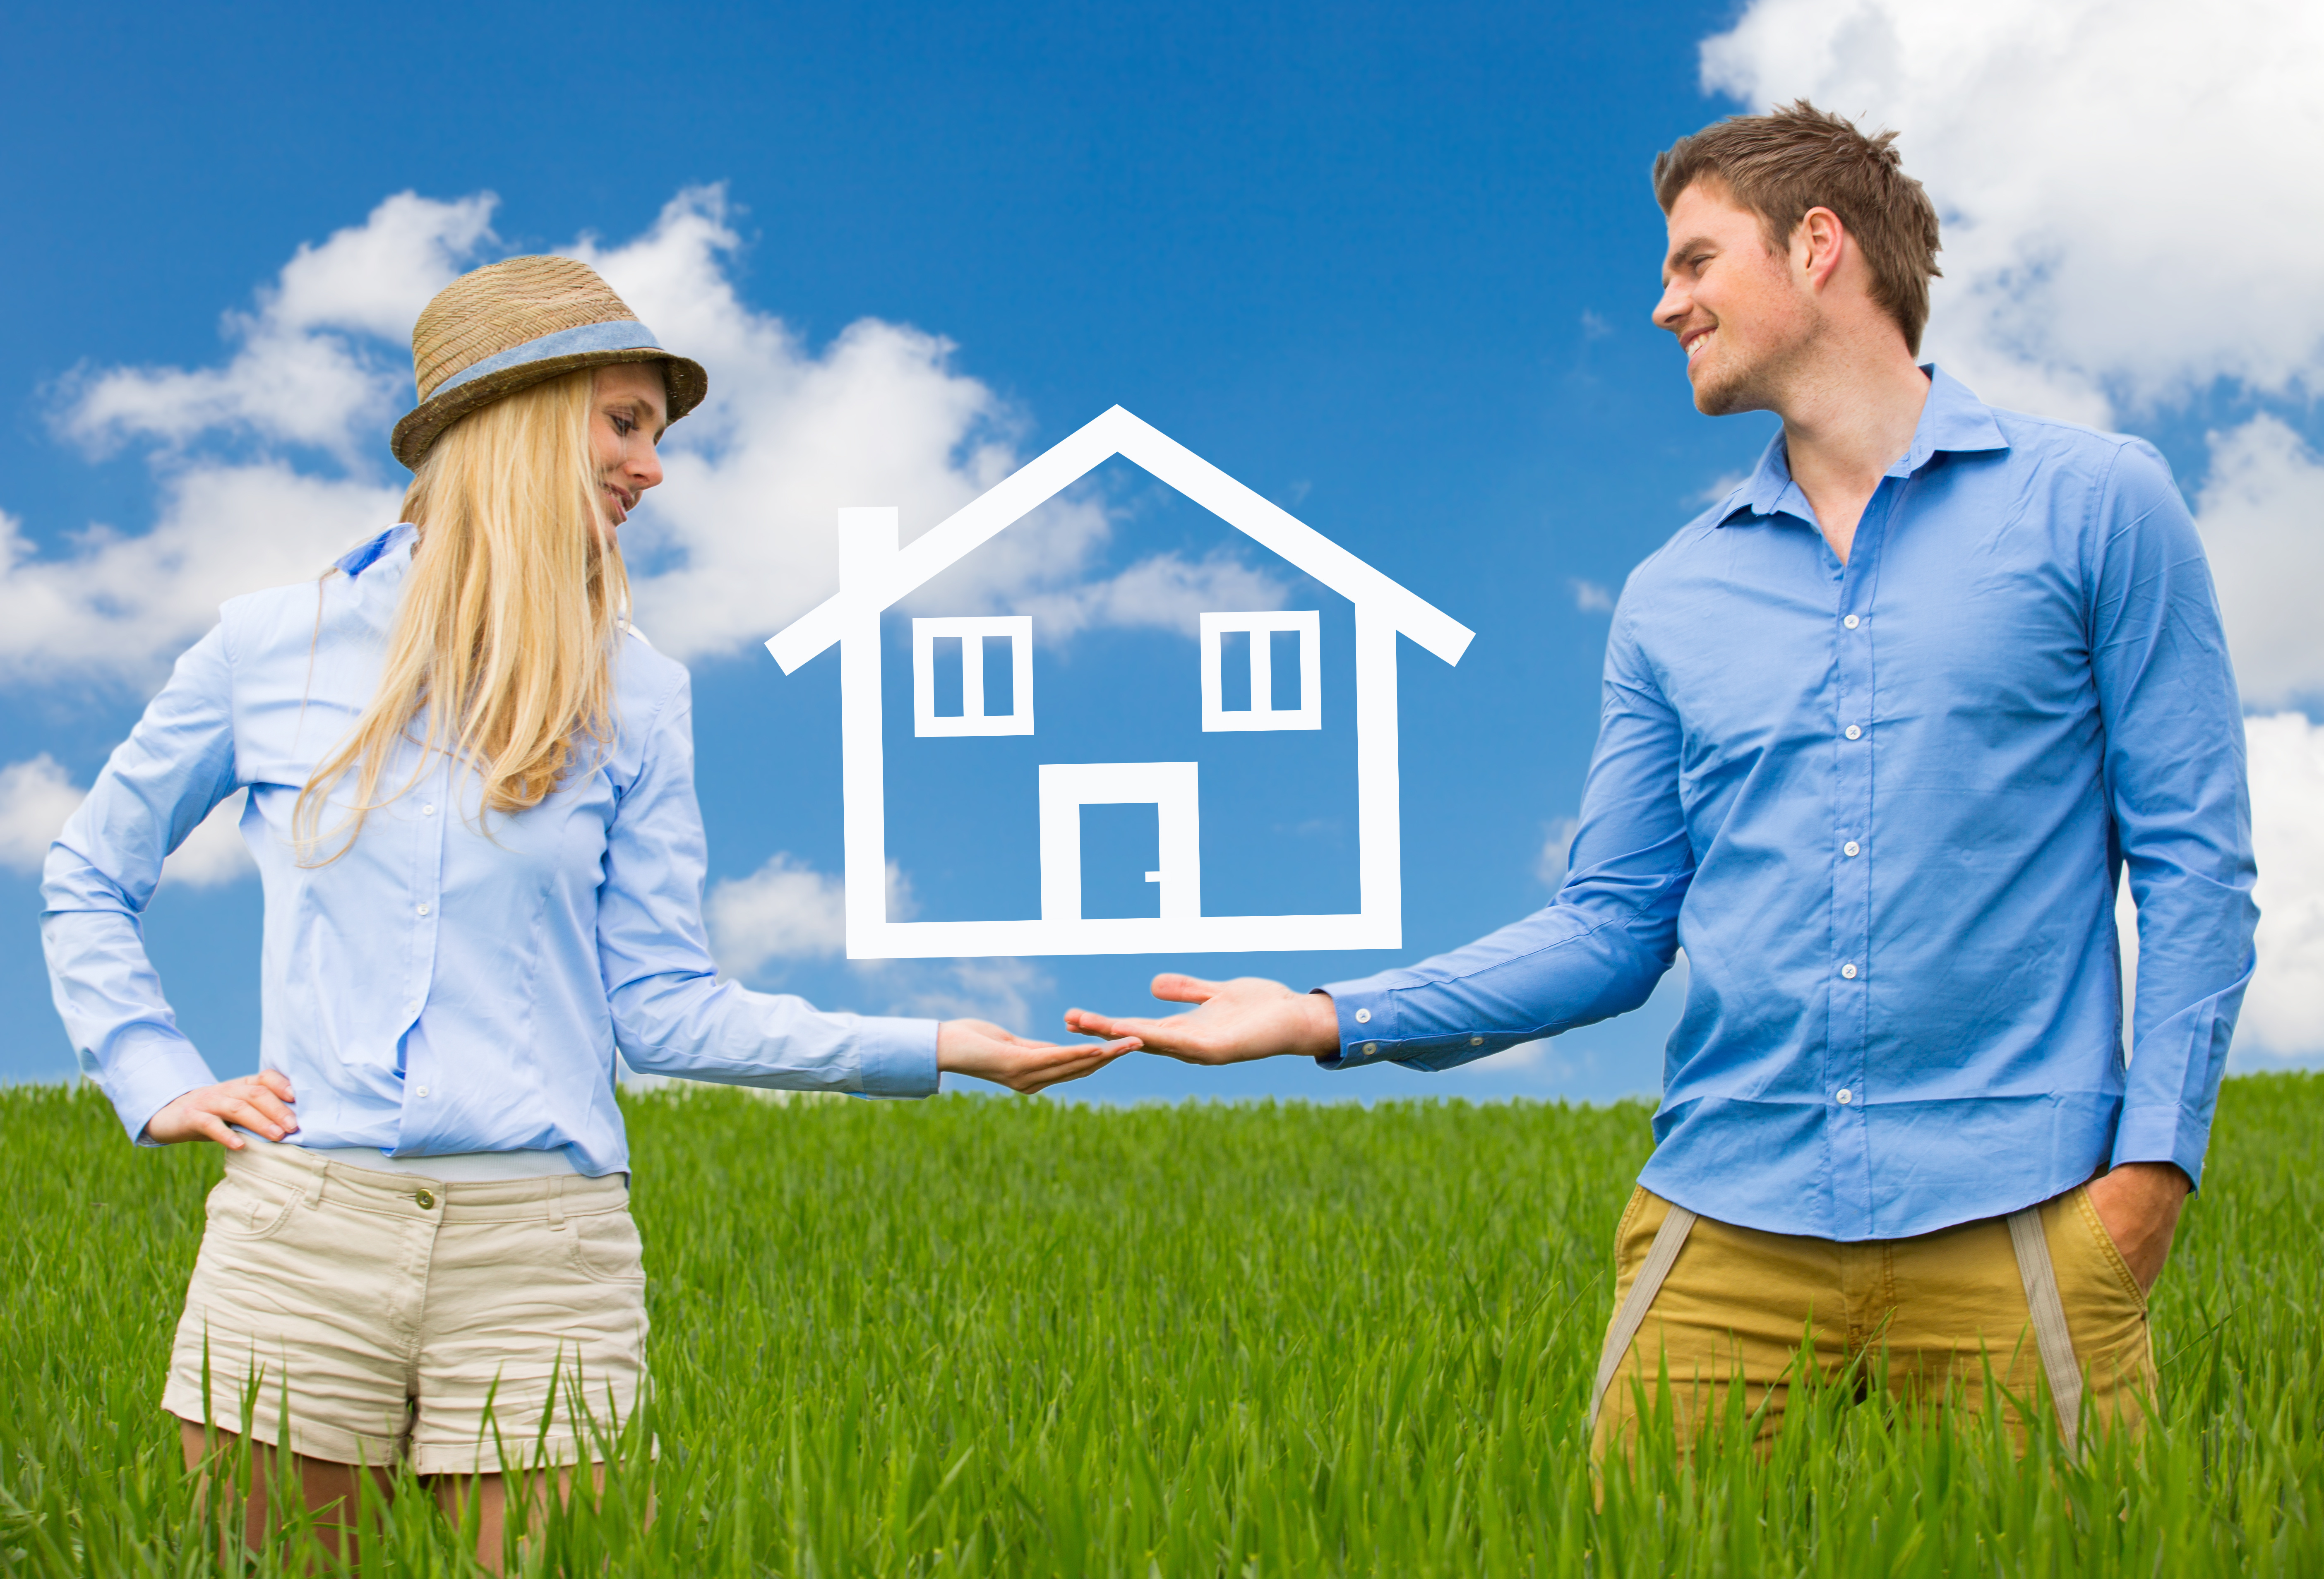 людей в картинках для домашних предложений продаже квартир